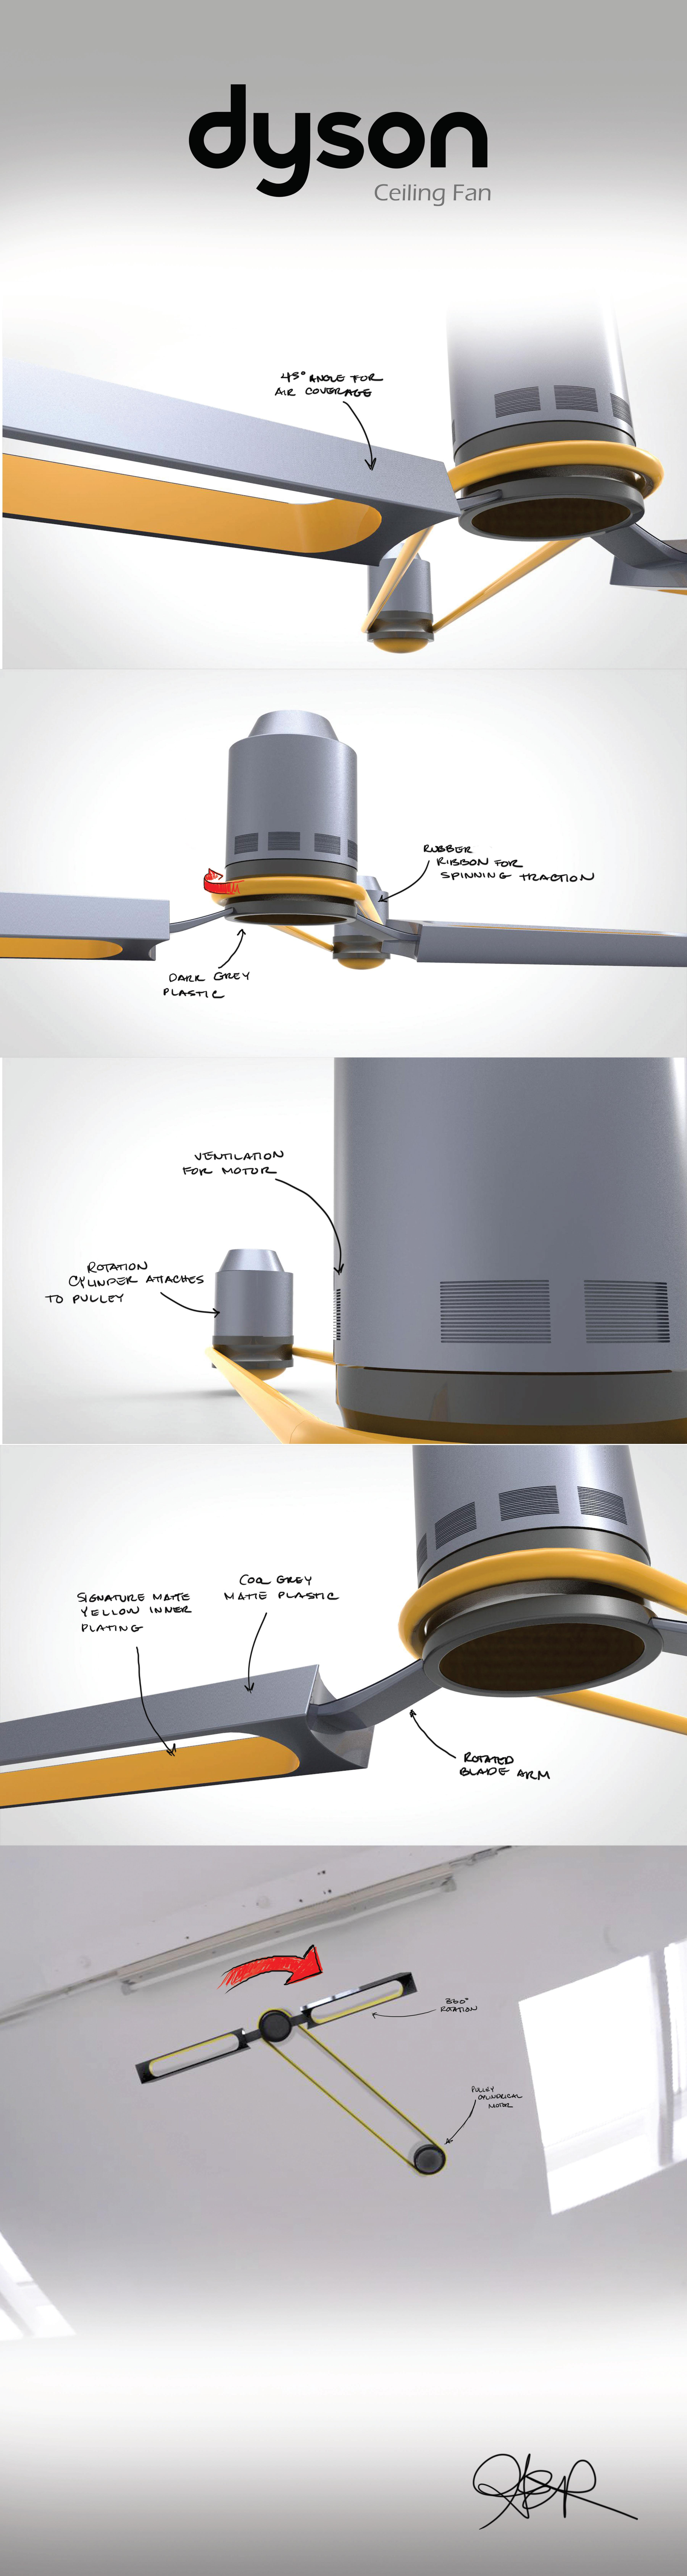 Dyson Ceiling Fan Concept on Behance